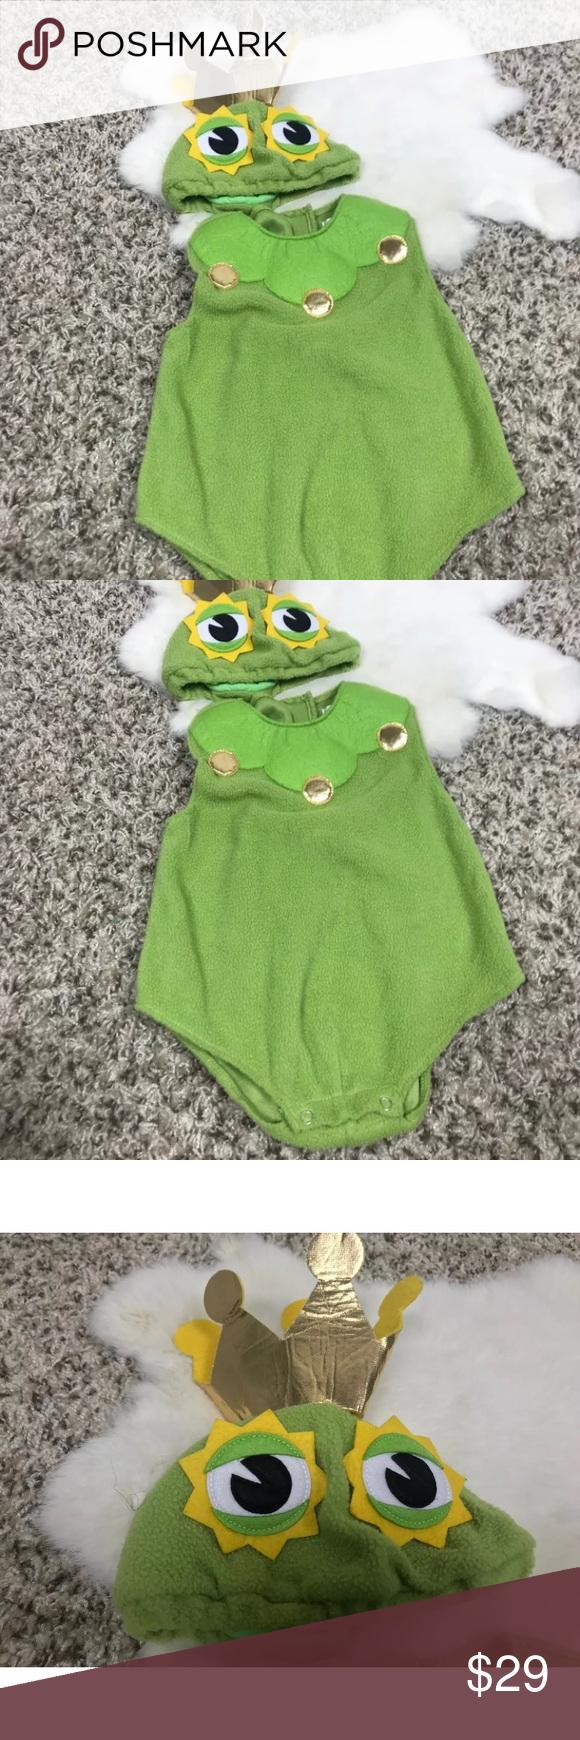 Pottery Barn Kids Boy Prince Frog Costume Sz 612M